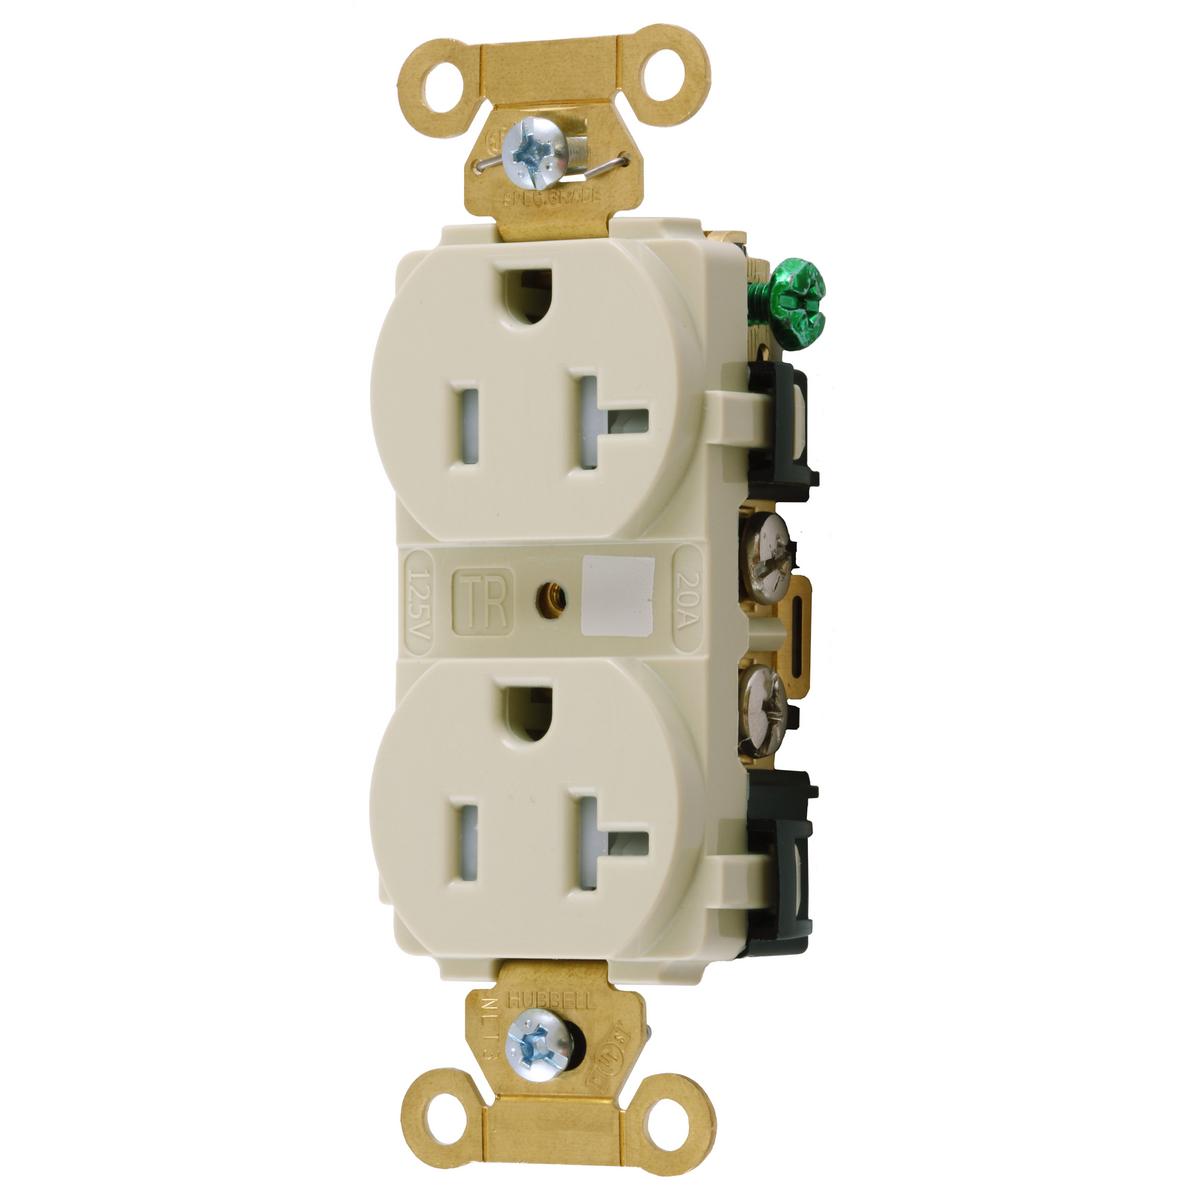 Hbl5362 Brand Wiring Device Kellems